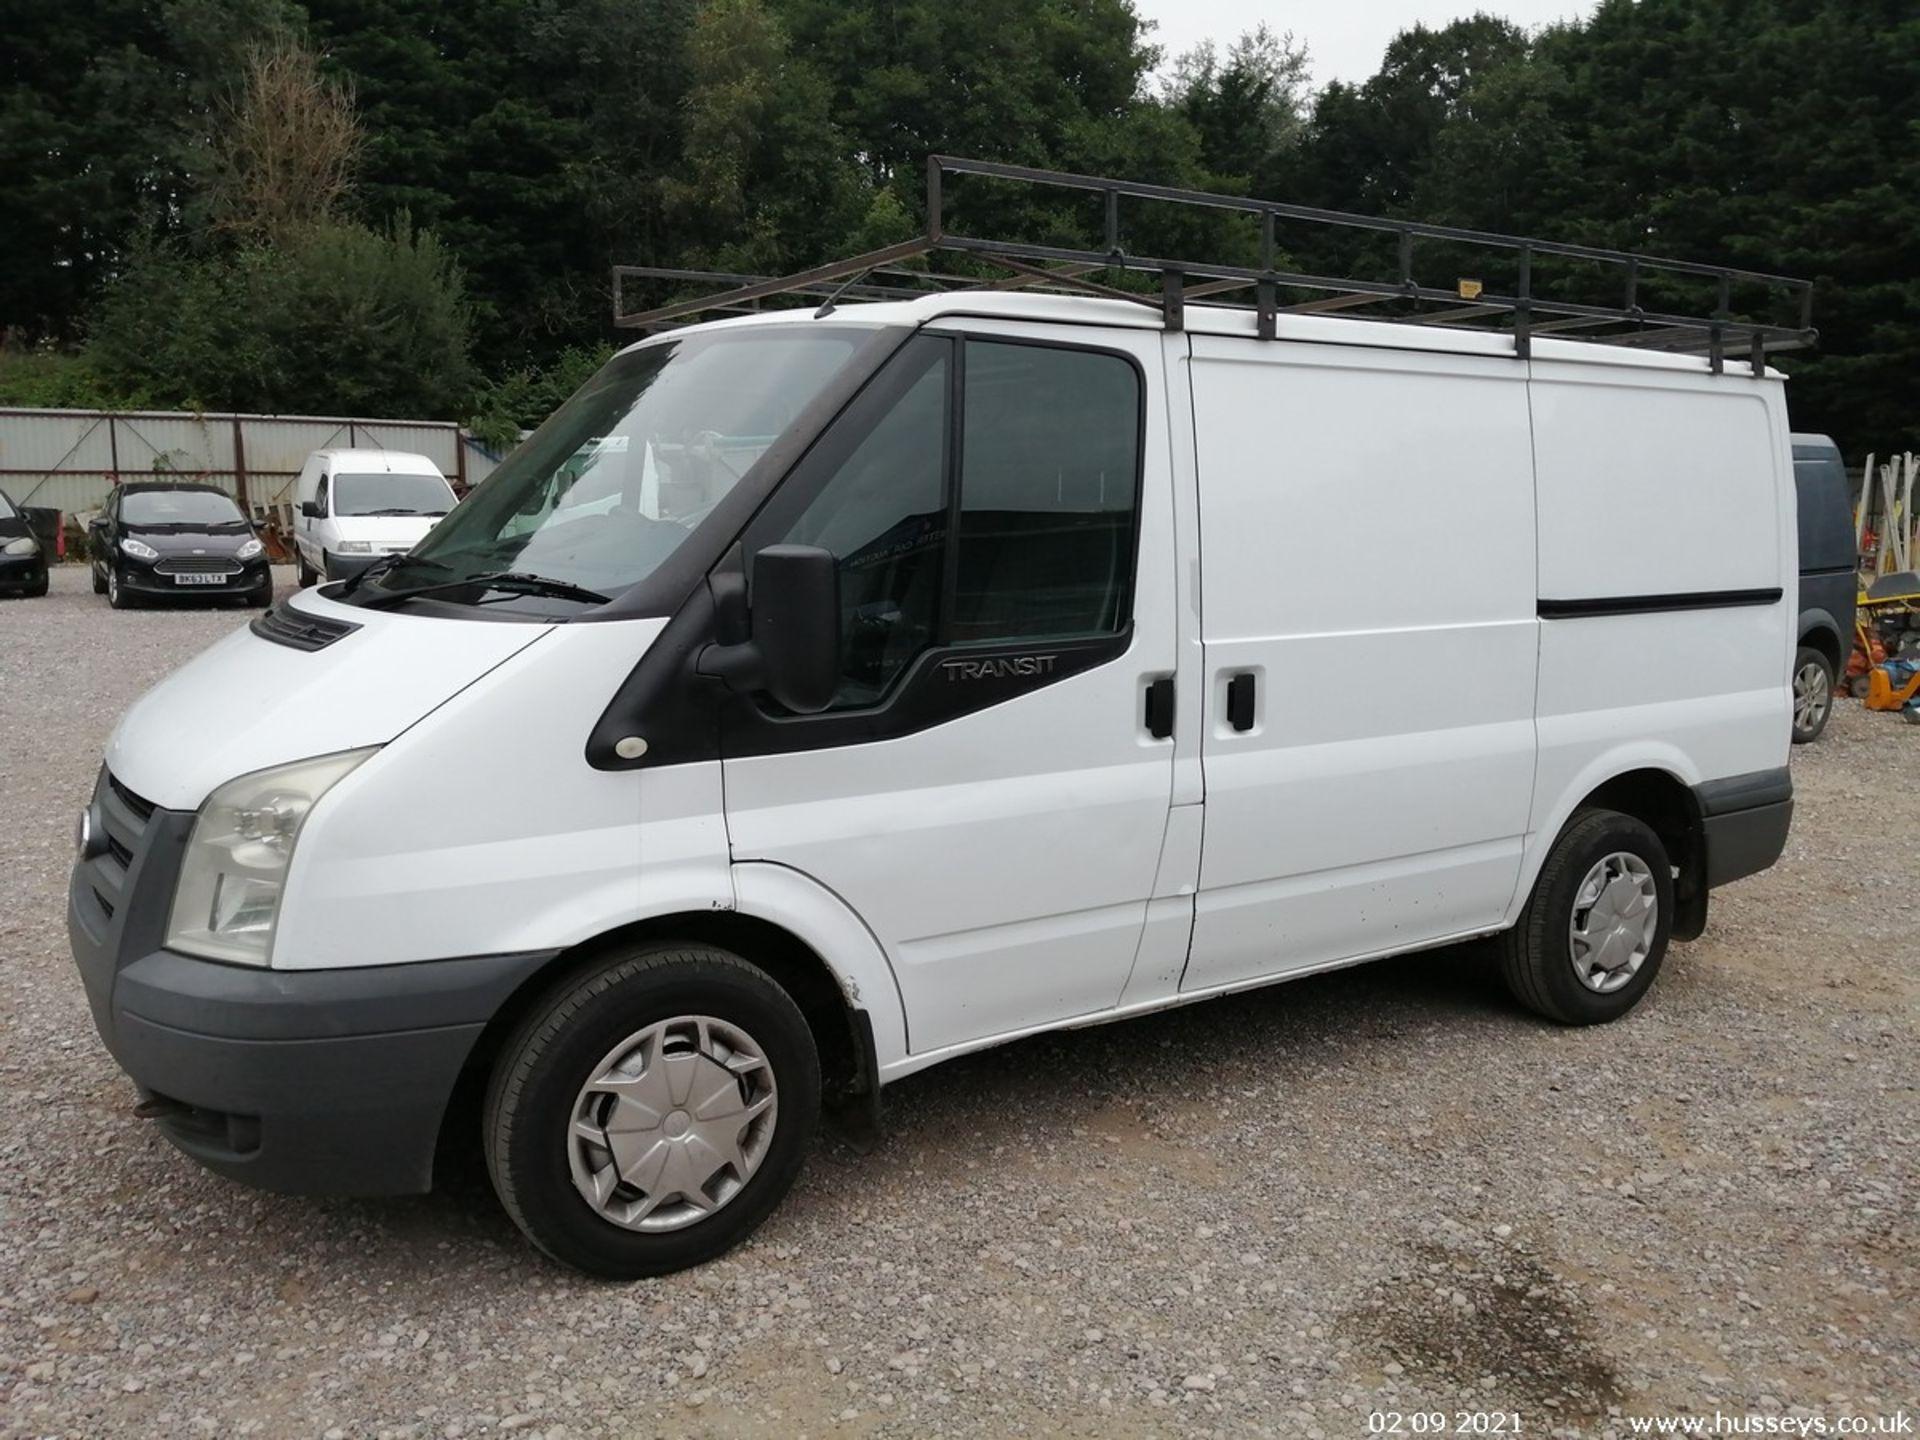 10/60 FORD TRANSIT 85 T260M FWD - 2198cc 5dr Van (White, 237k)